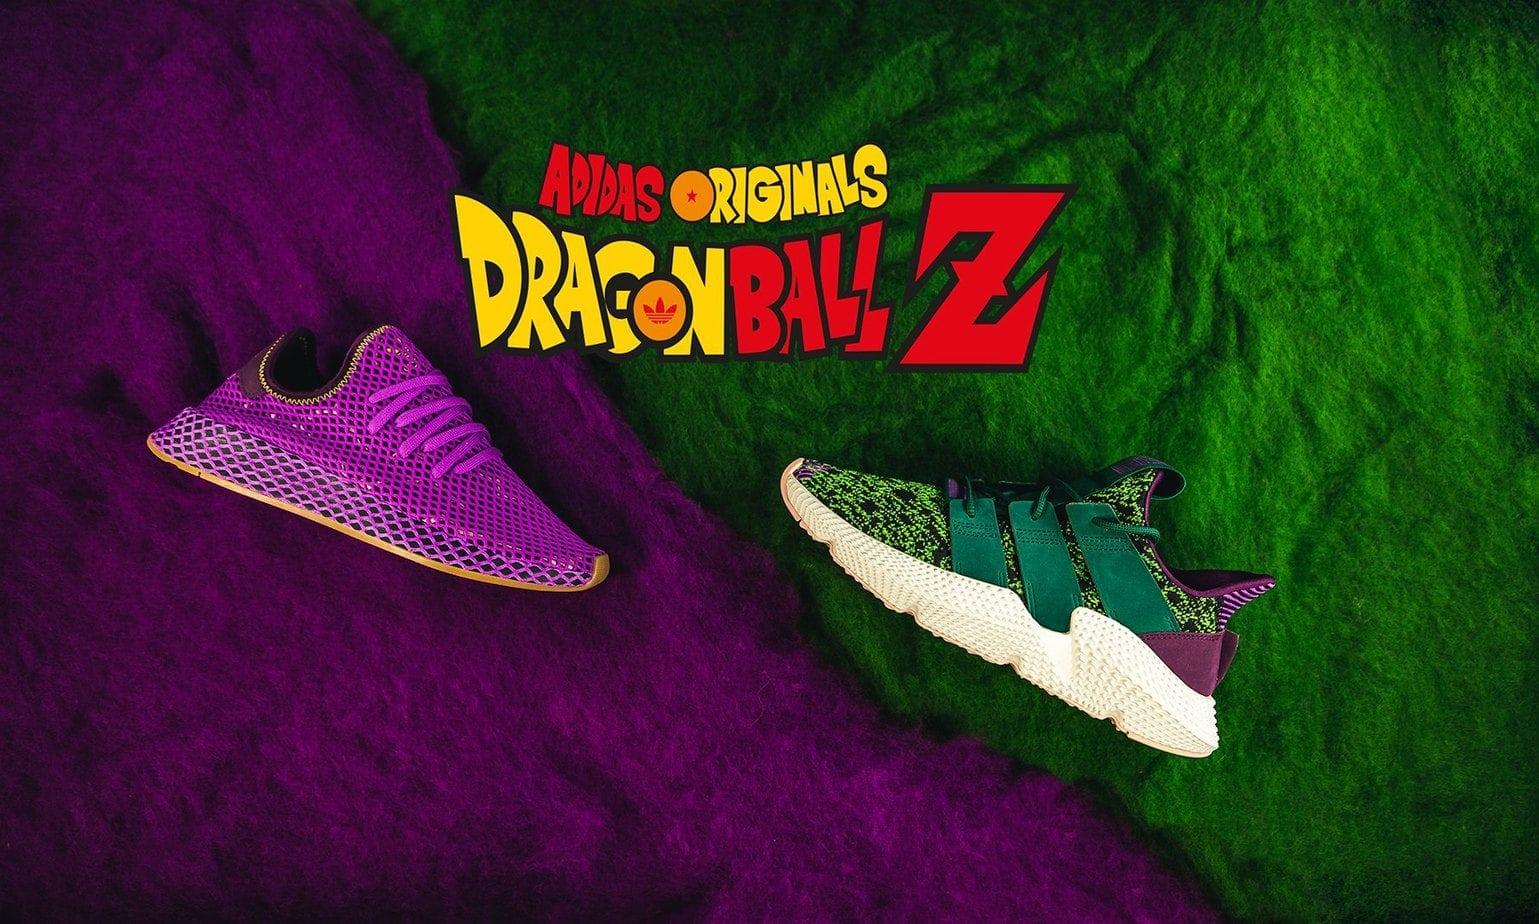 Dragon Ball Z x adidas Son Gohan Cell Online Links - JustFreshKicks